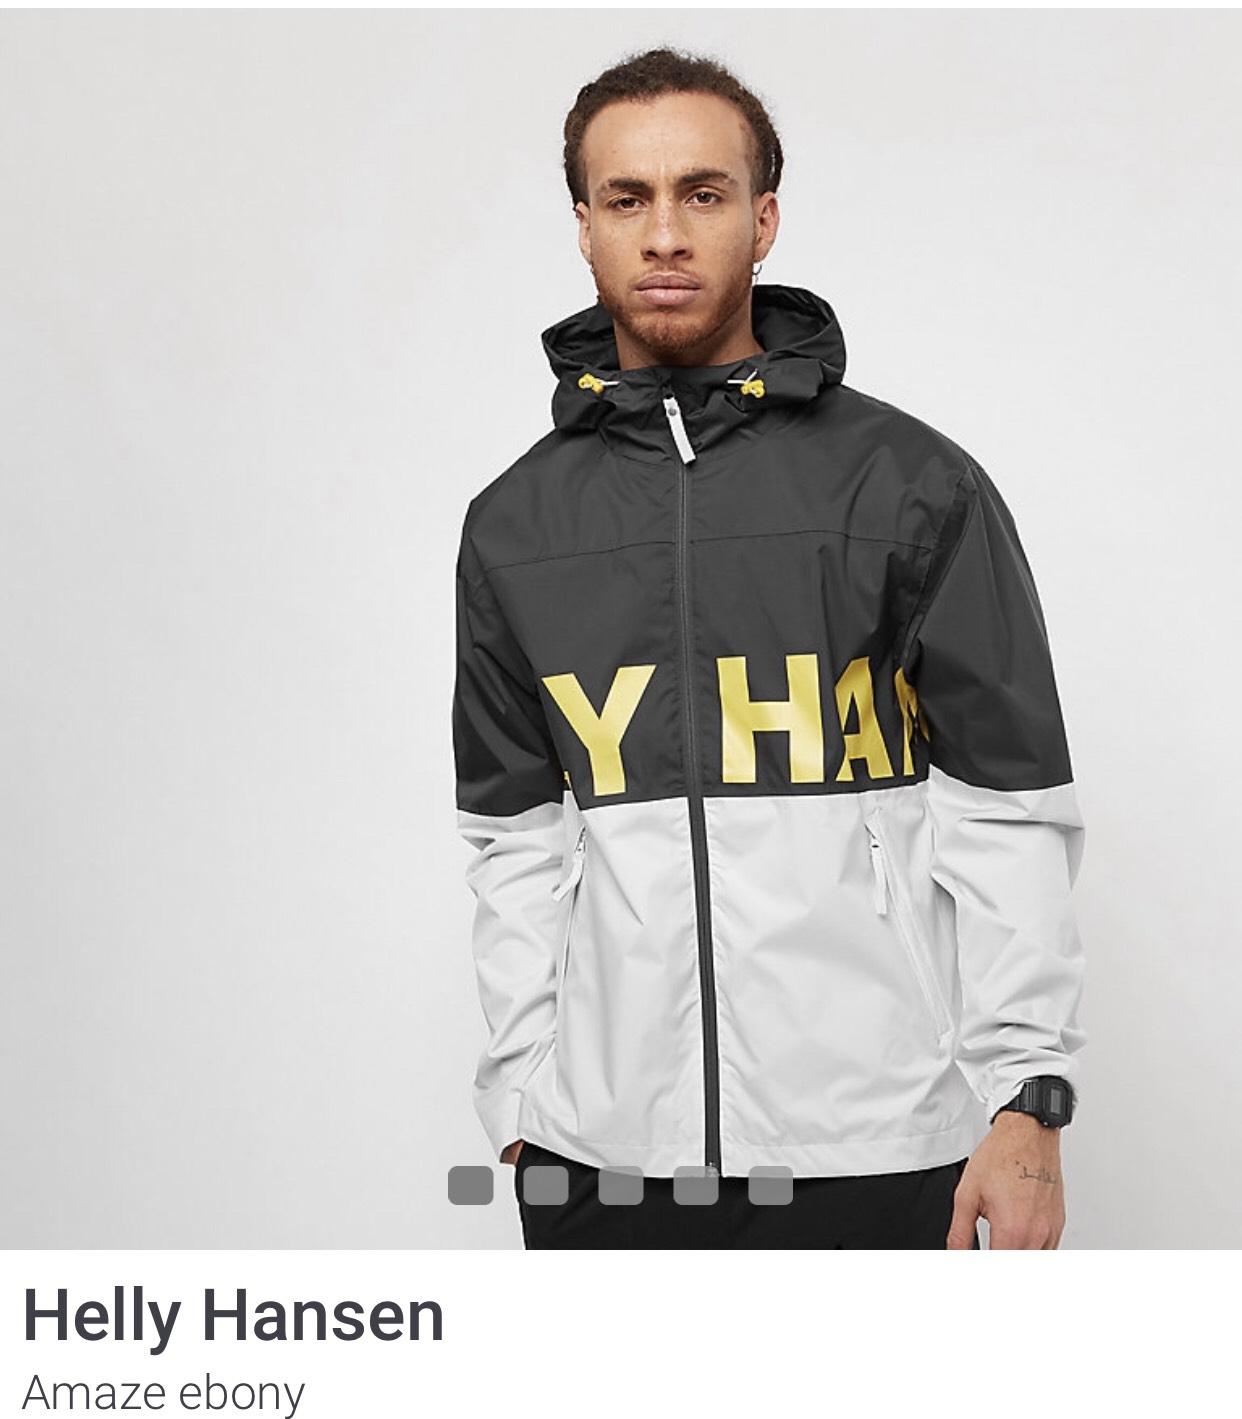 Helly Hansen amaze ebony